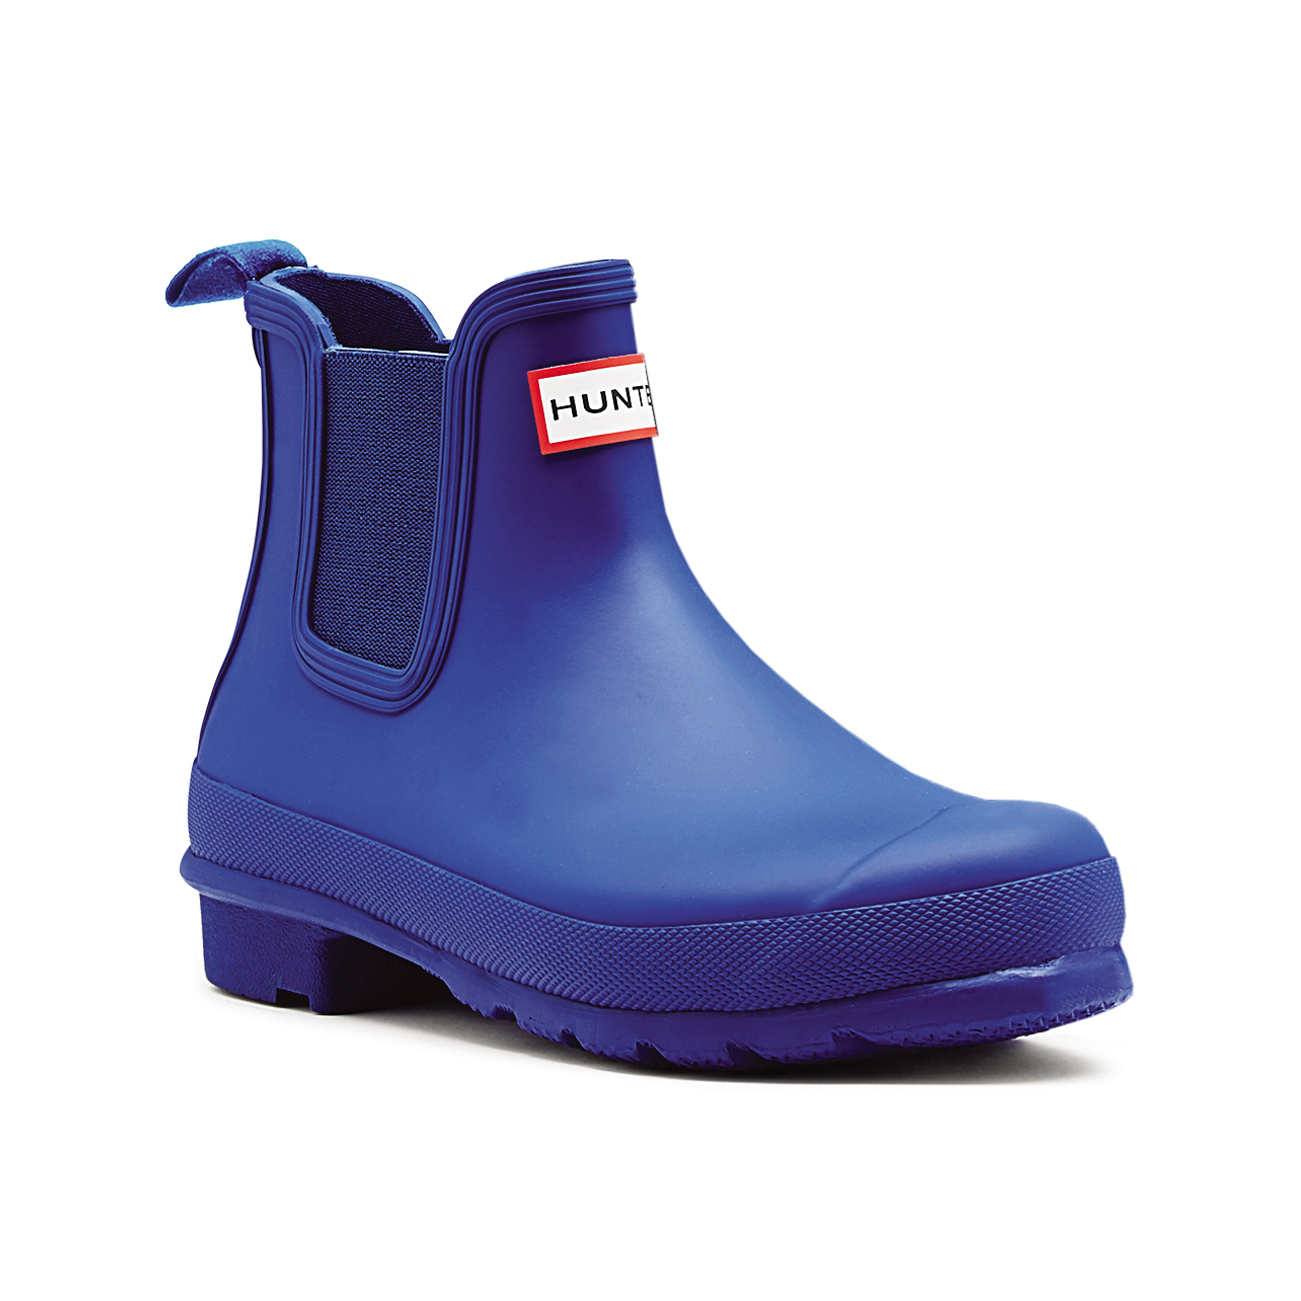 Damen Regen Hunter Original Chelsea Schnee Regen Damen Wasserdicht Knöchel Stiefel EU 36-43 3c6dac